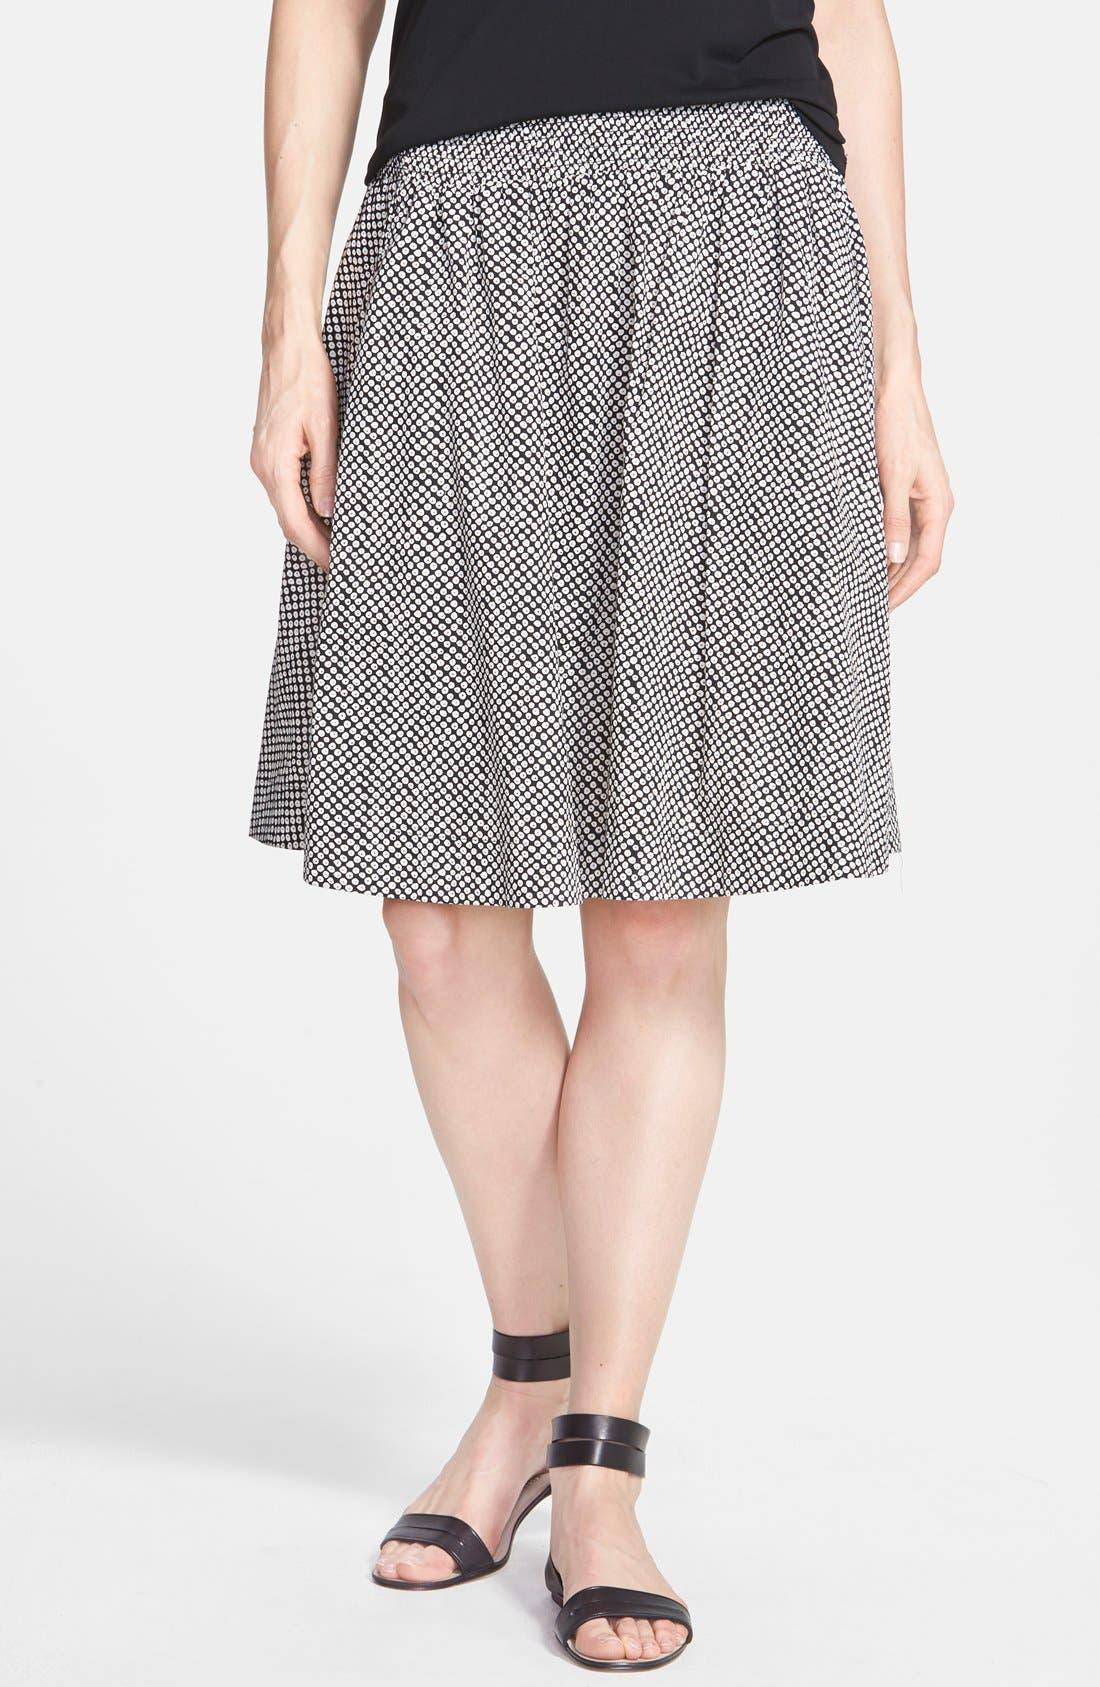 Alternate Image 1 Selected - Eileen Fisher Bandhini Print Organic Cotton Skirt